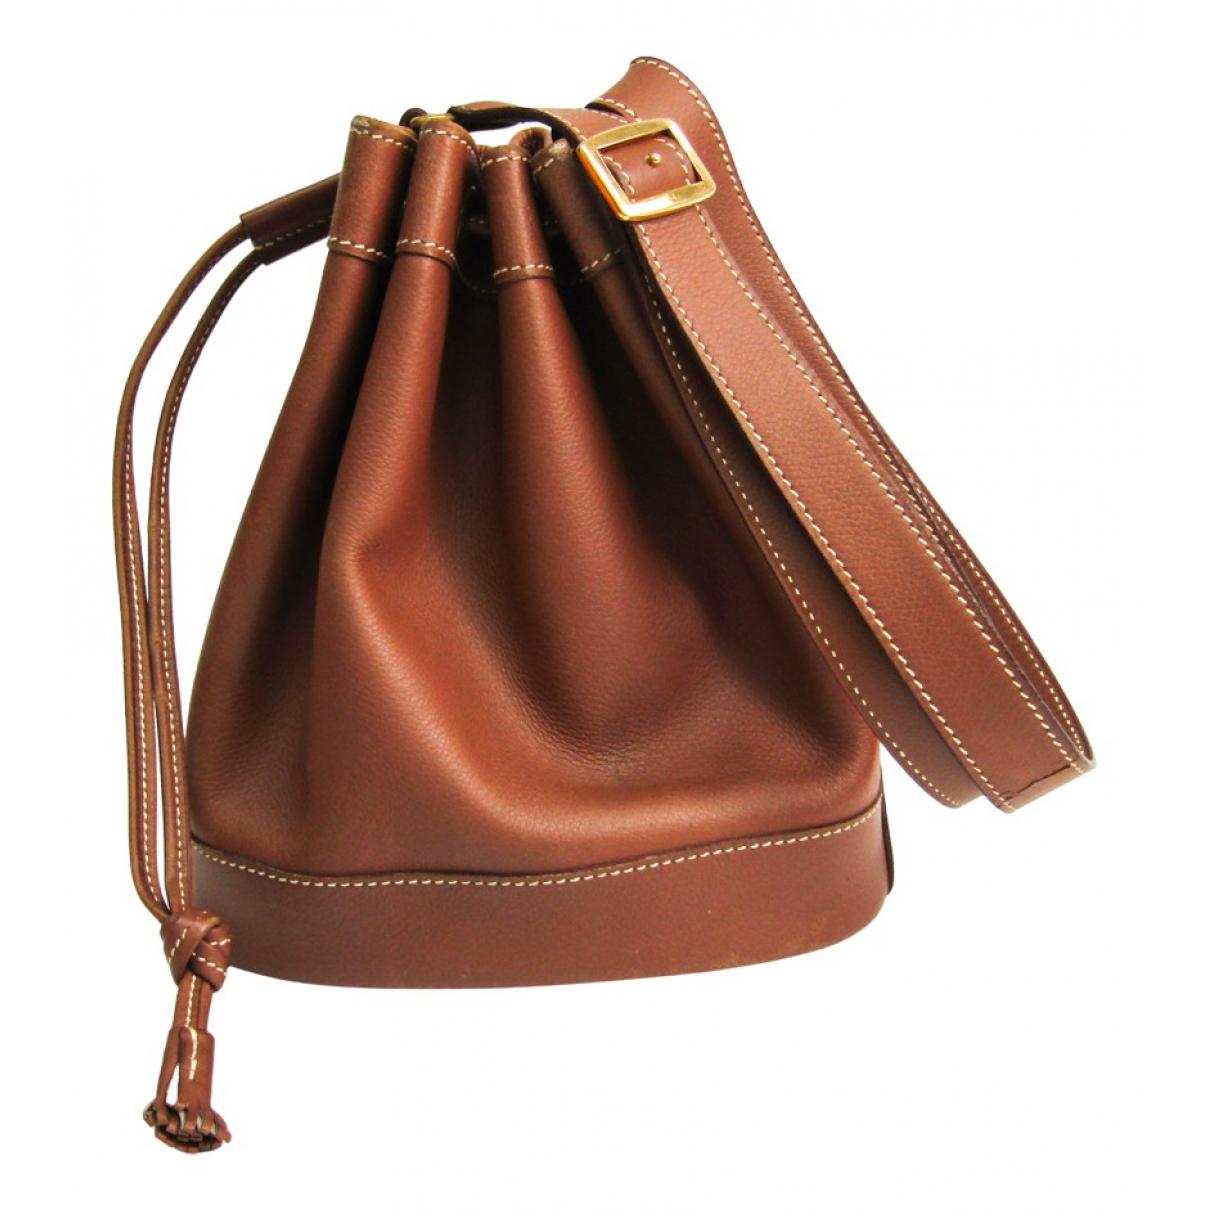 Hermès Market Brown Leather handbag for Women N